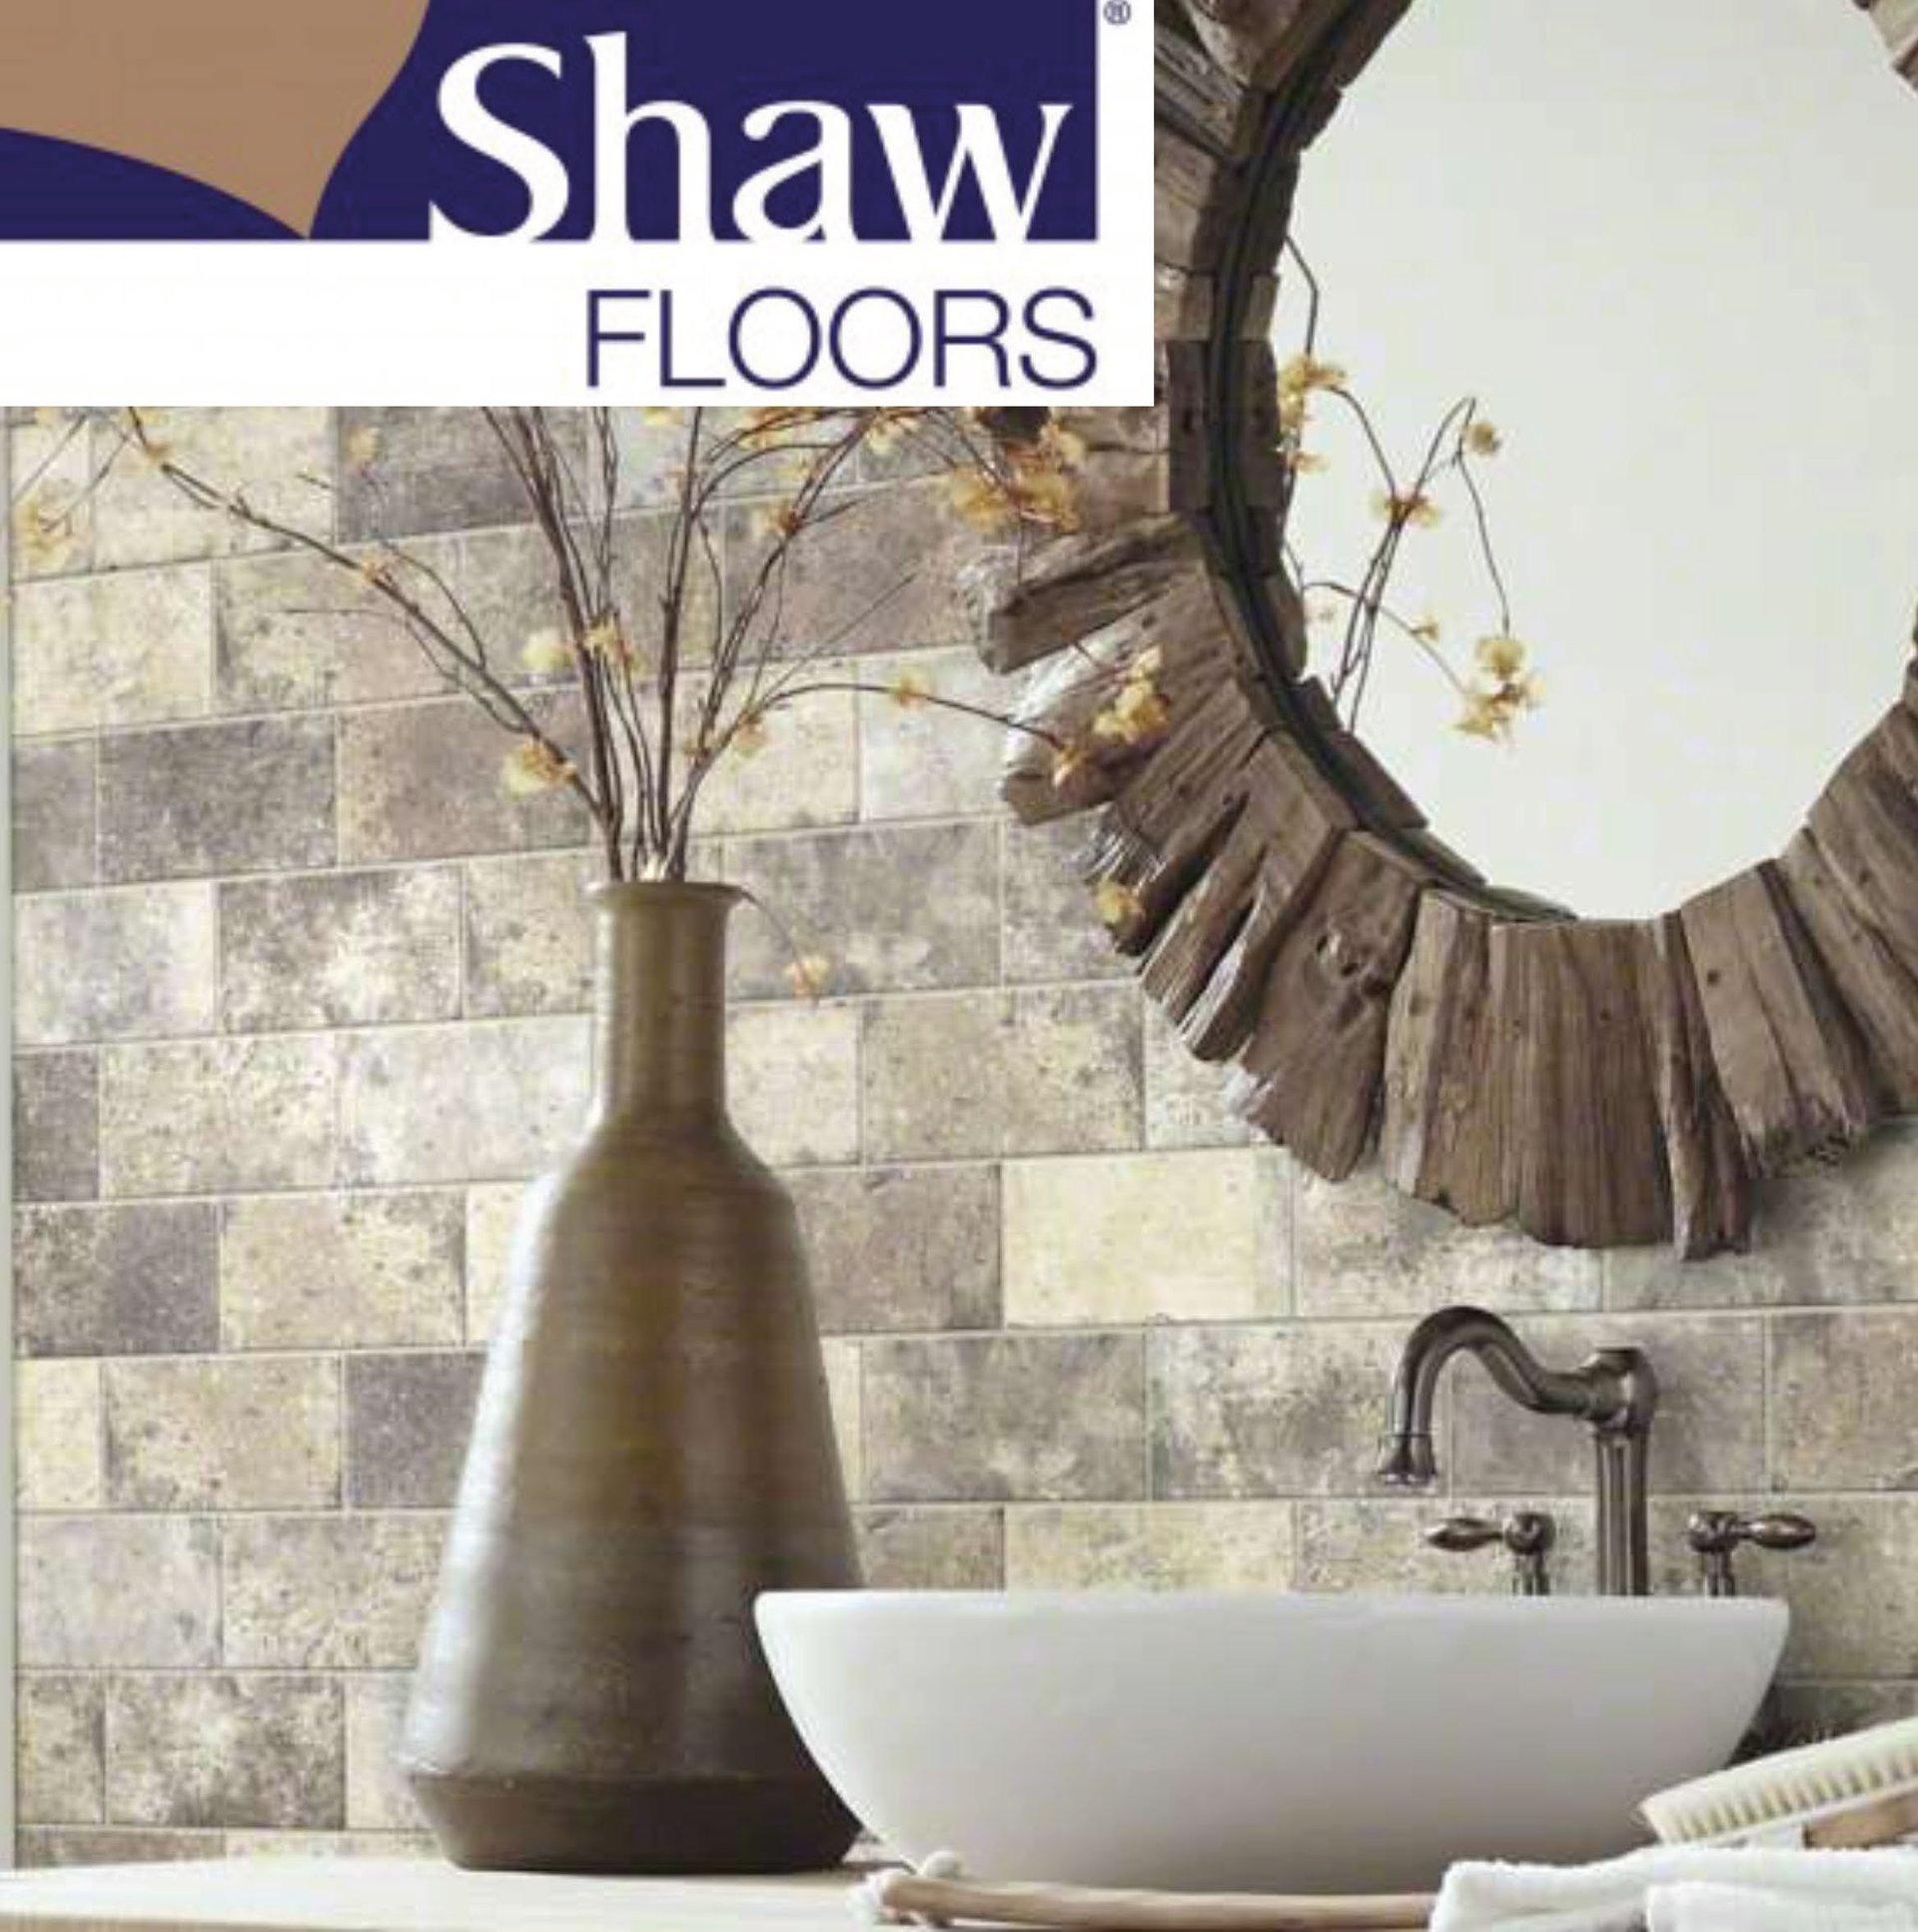 Shaw Floors Wall Tile